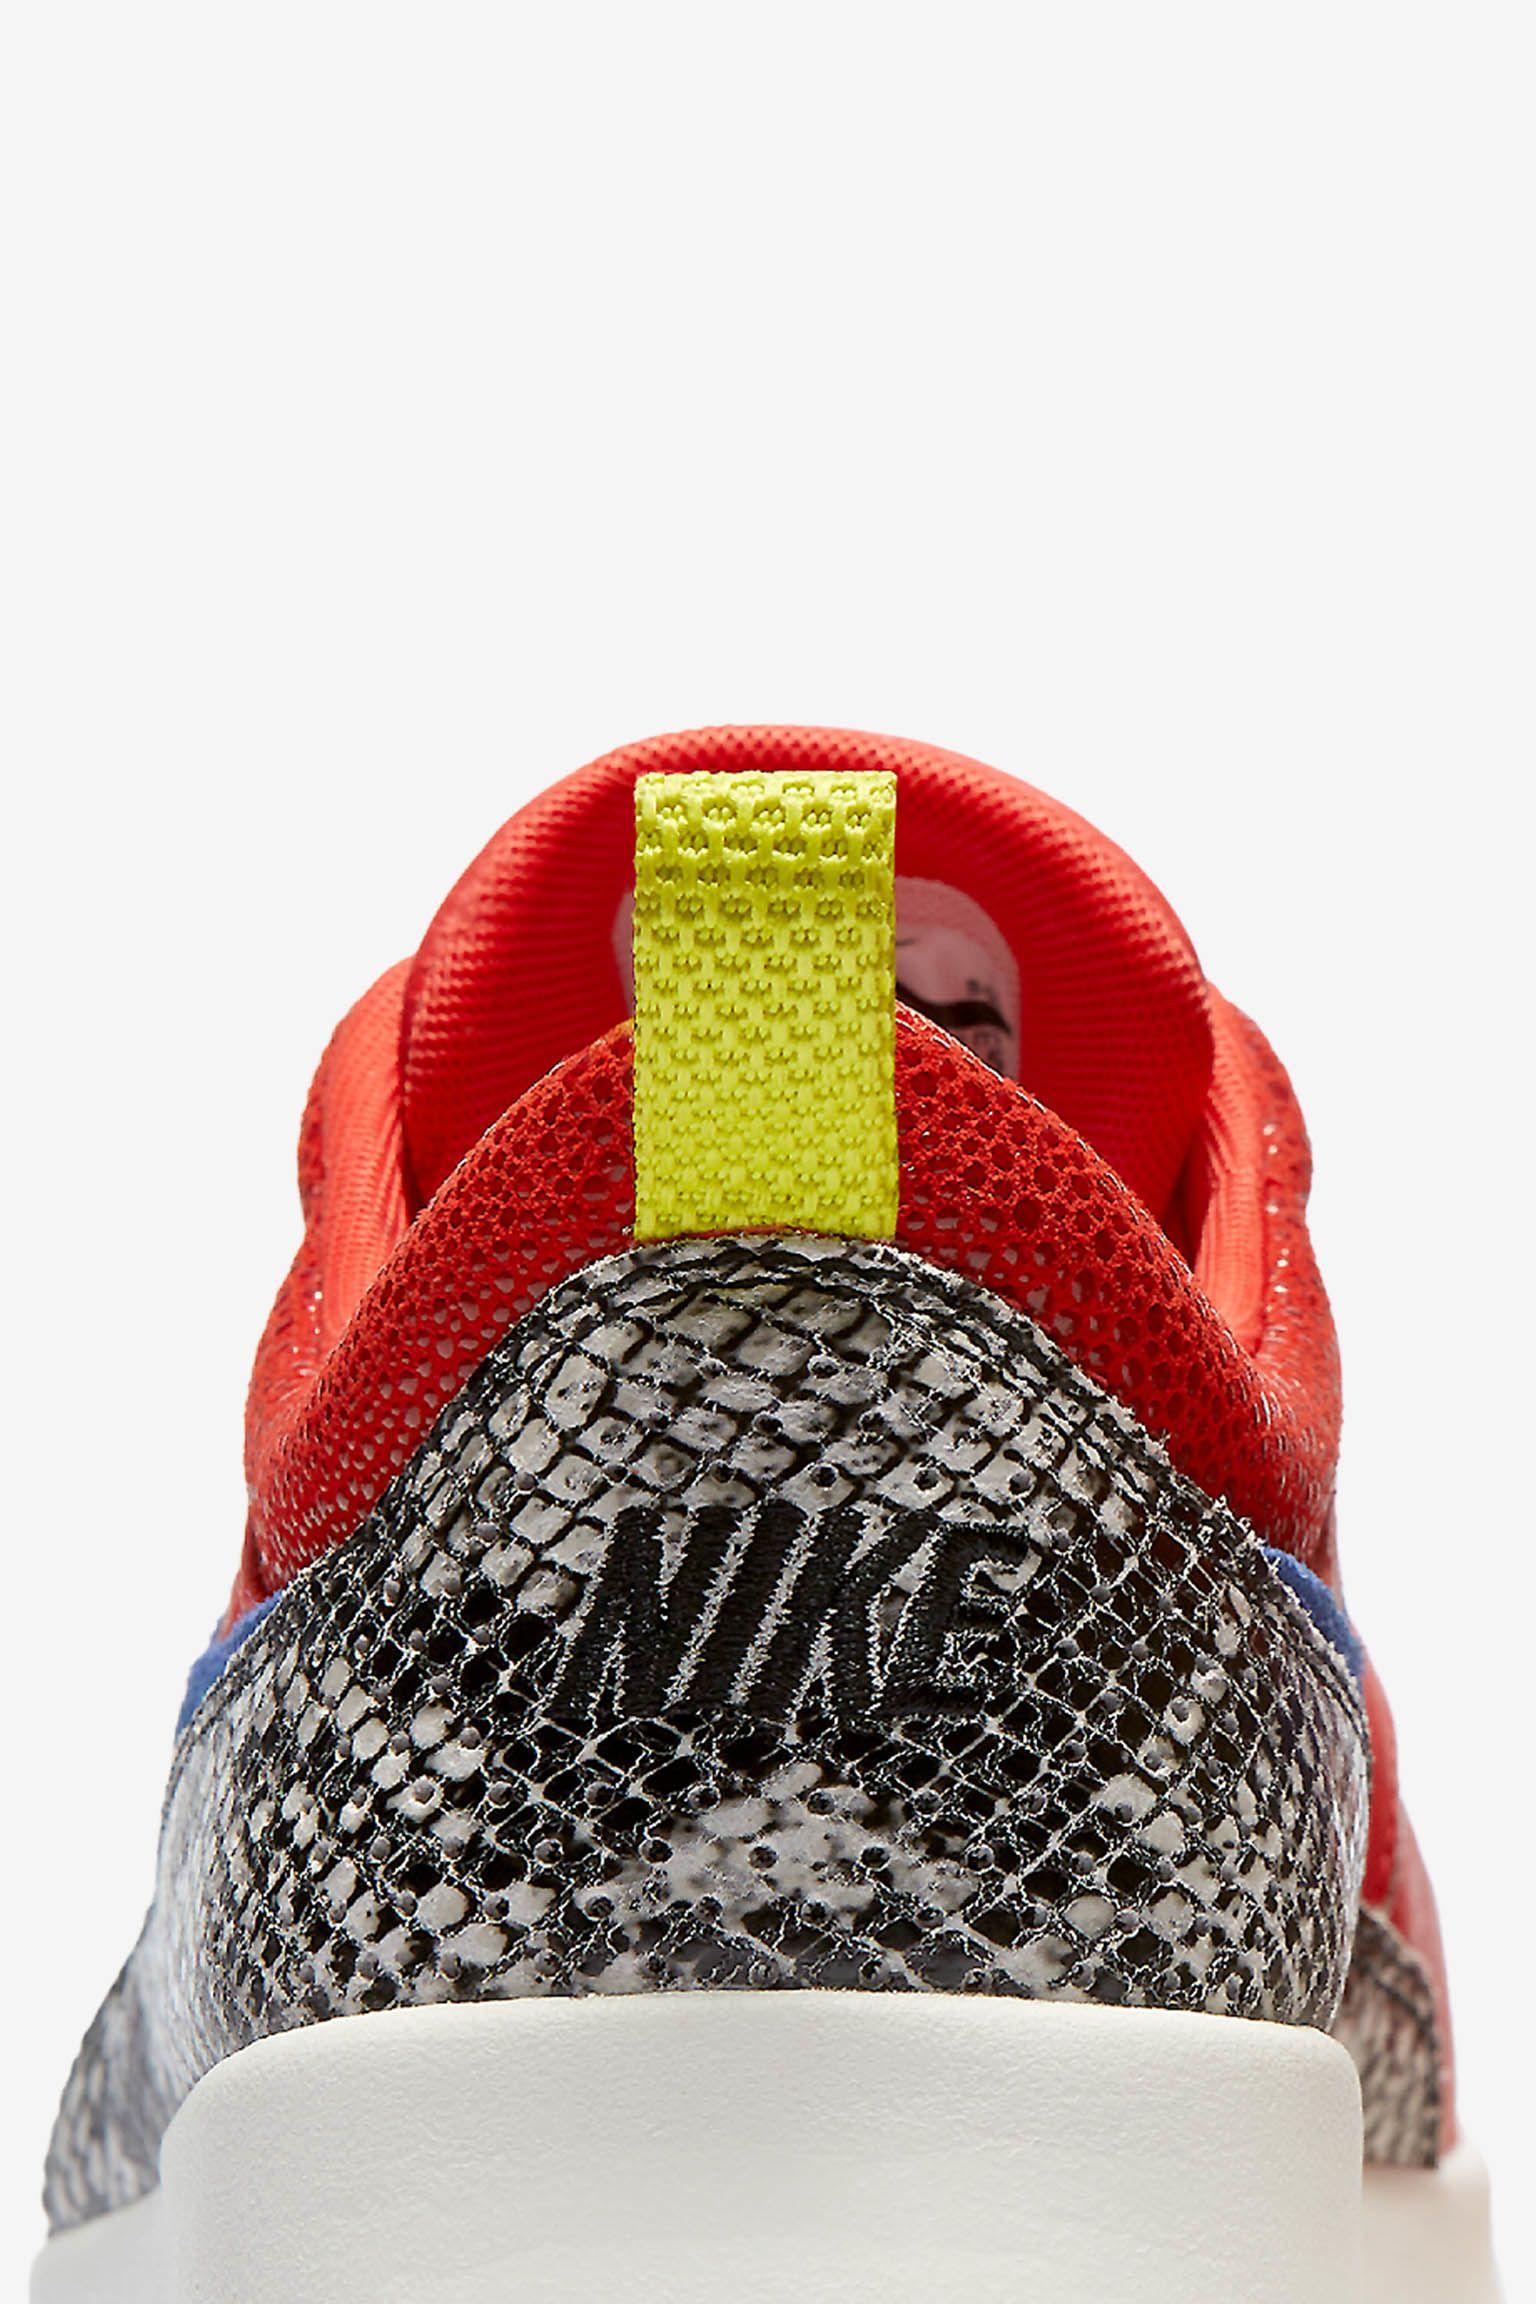 Women's Nike Air Max Thea LX 'Max Orange'